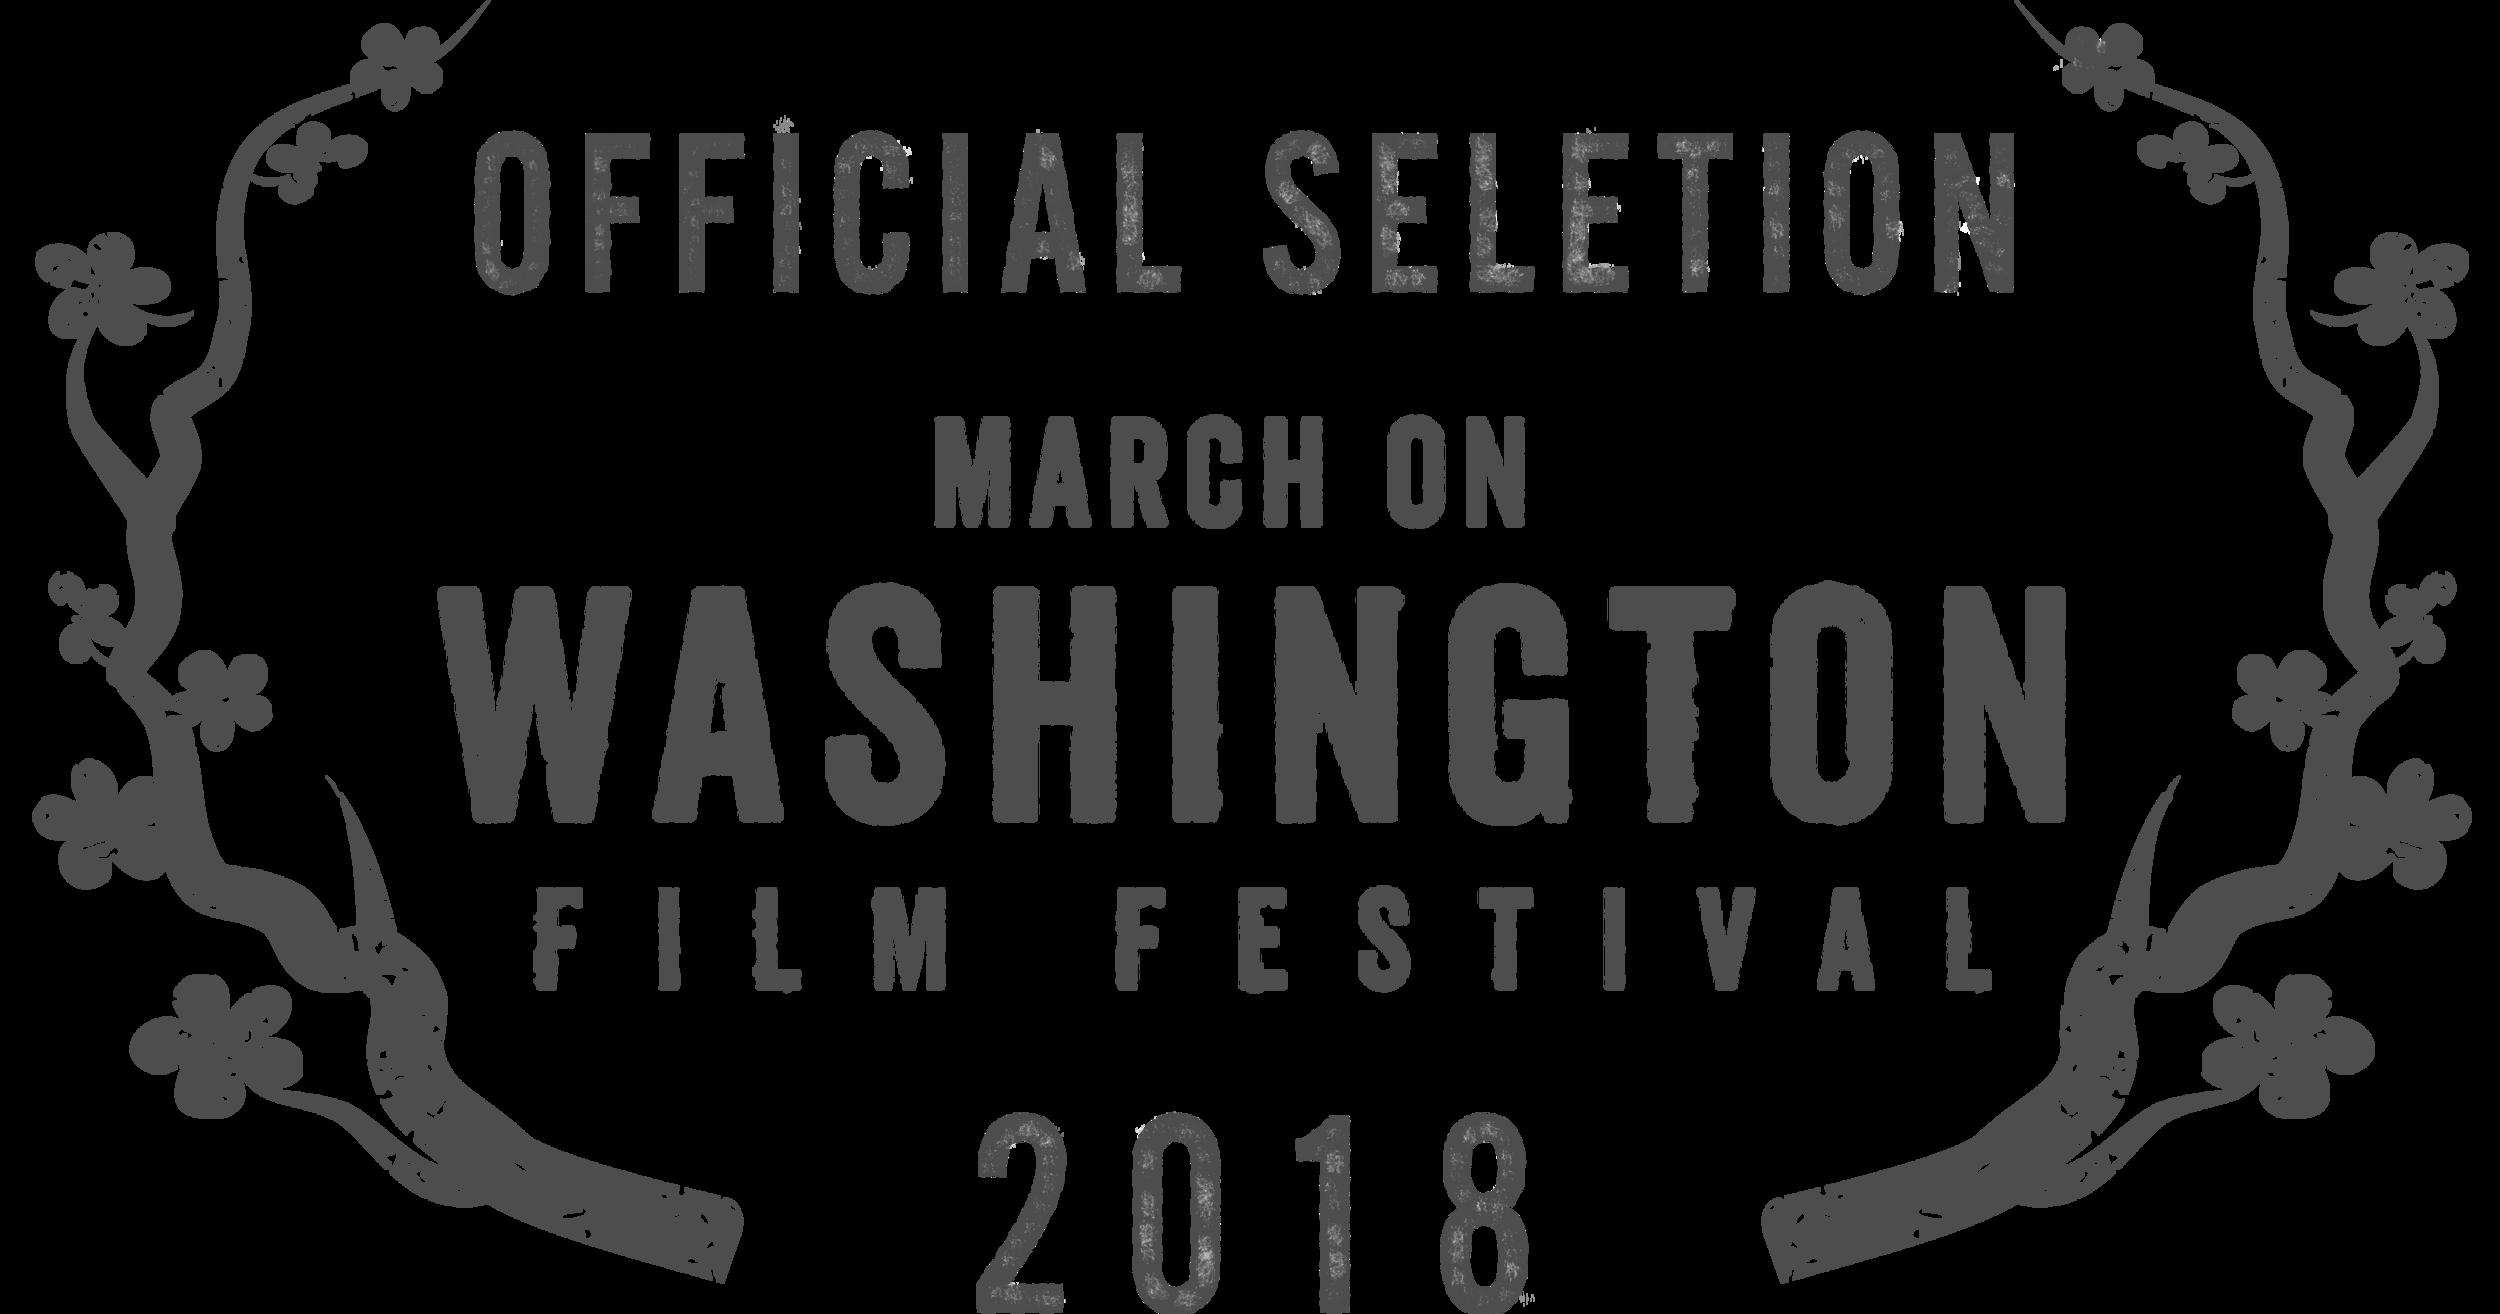 March on Washington Film Festival - D.C., July 19